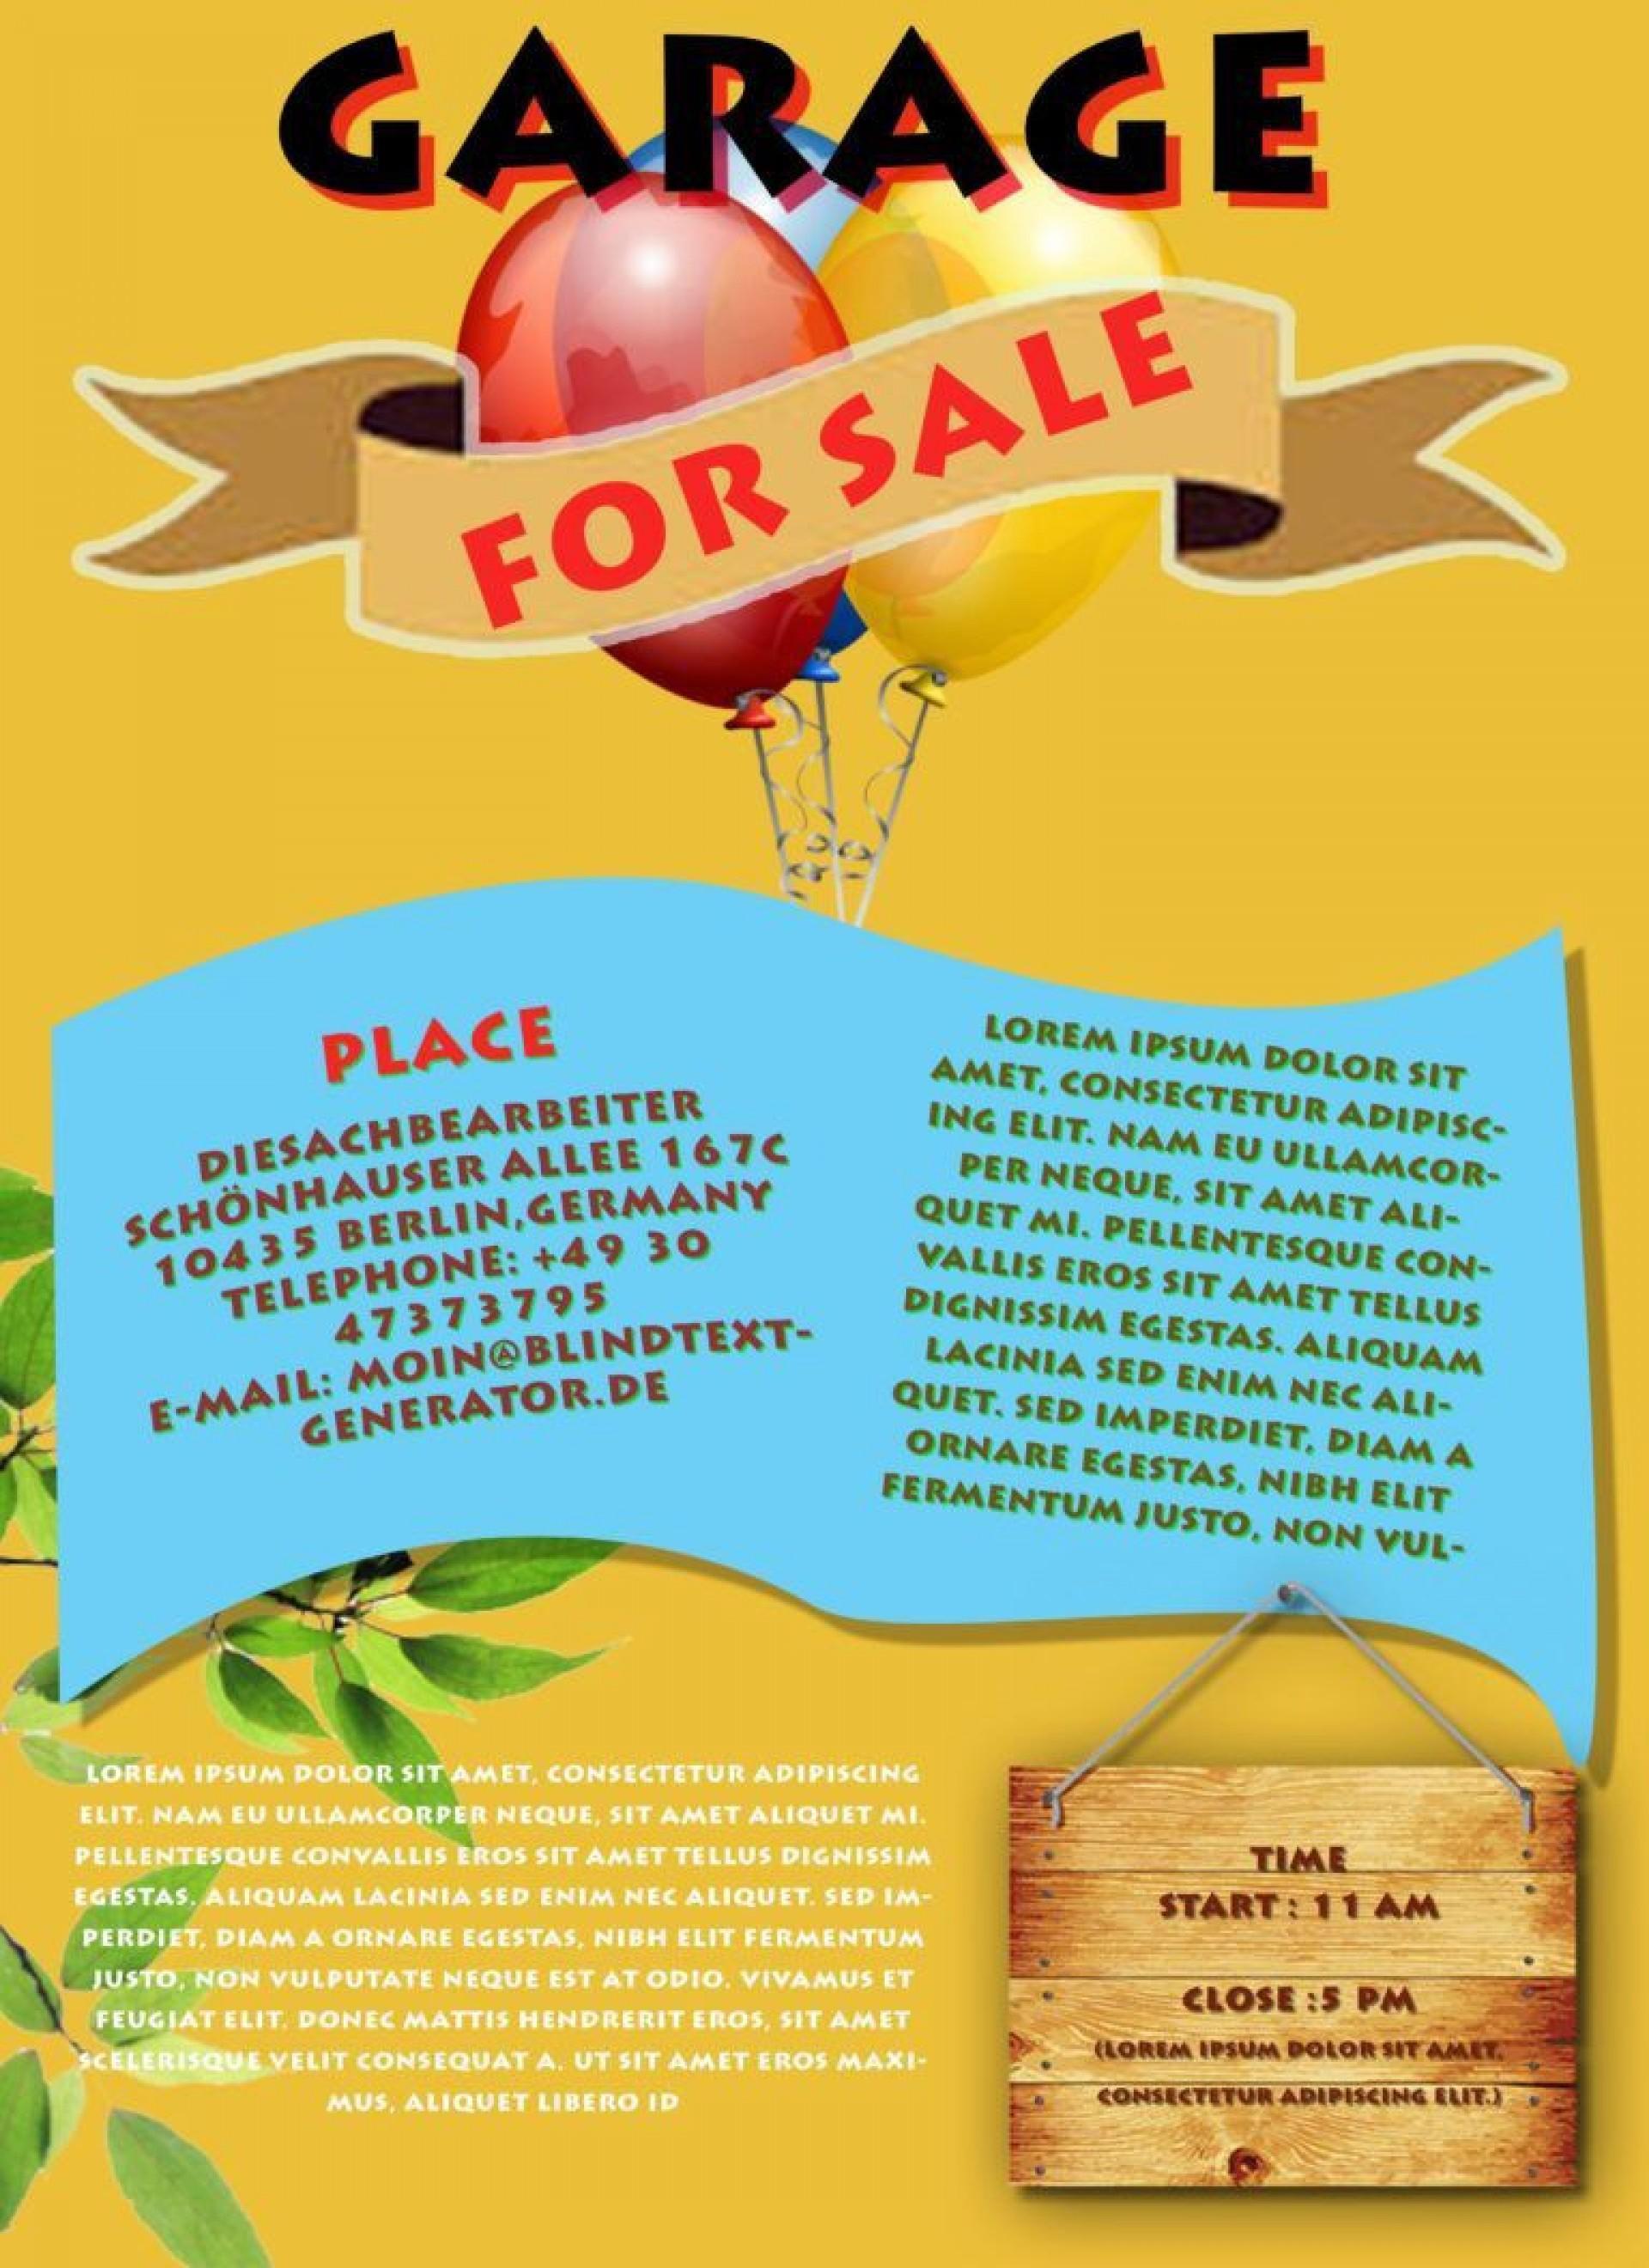 001 Simple Garage Sale Flyer Template Free Picture  Community Neighborhood Yard1920